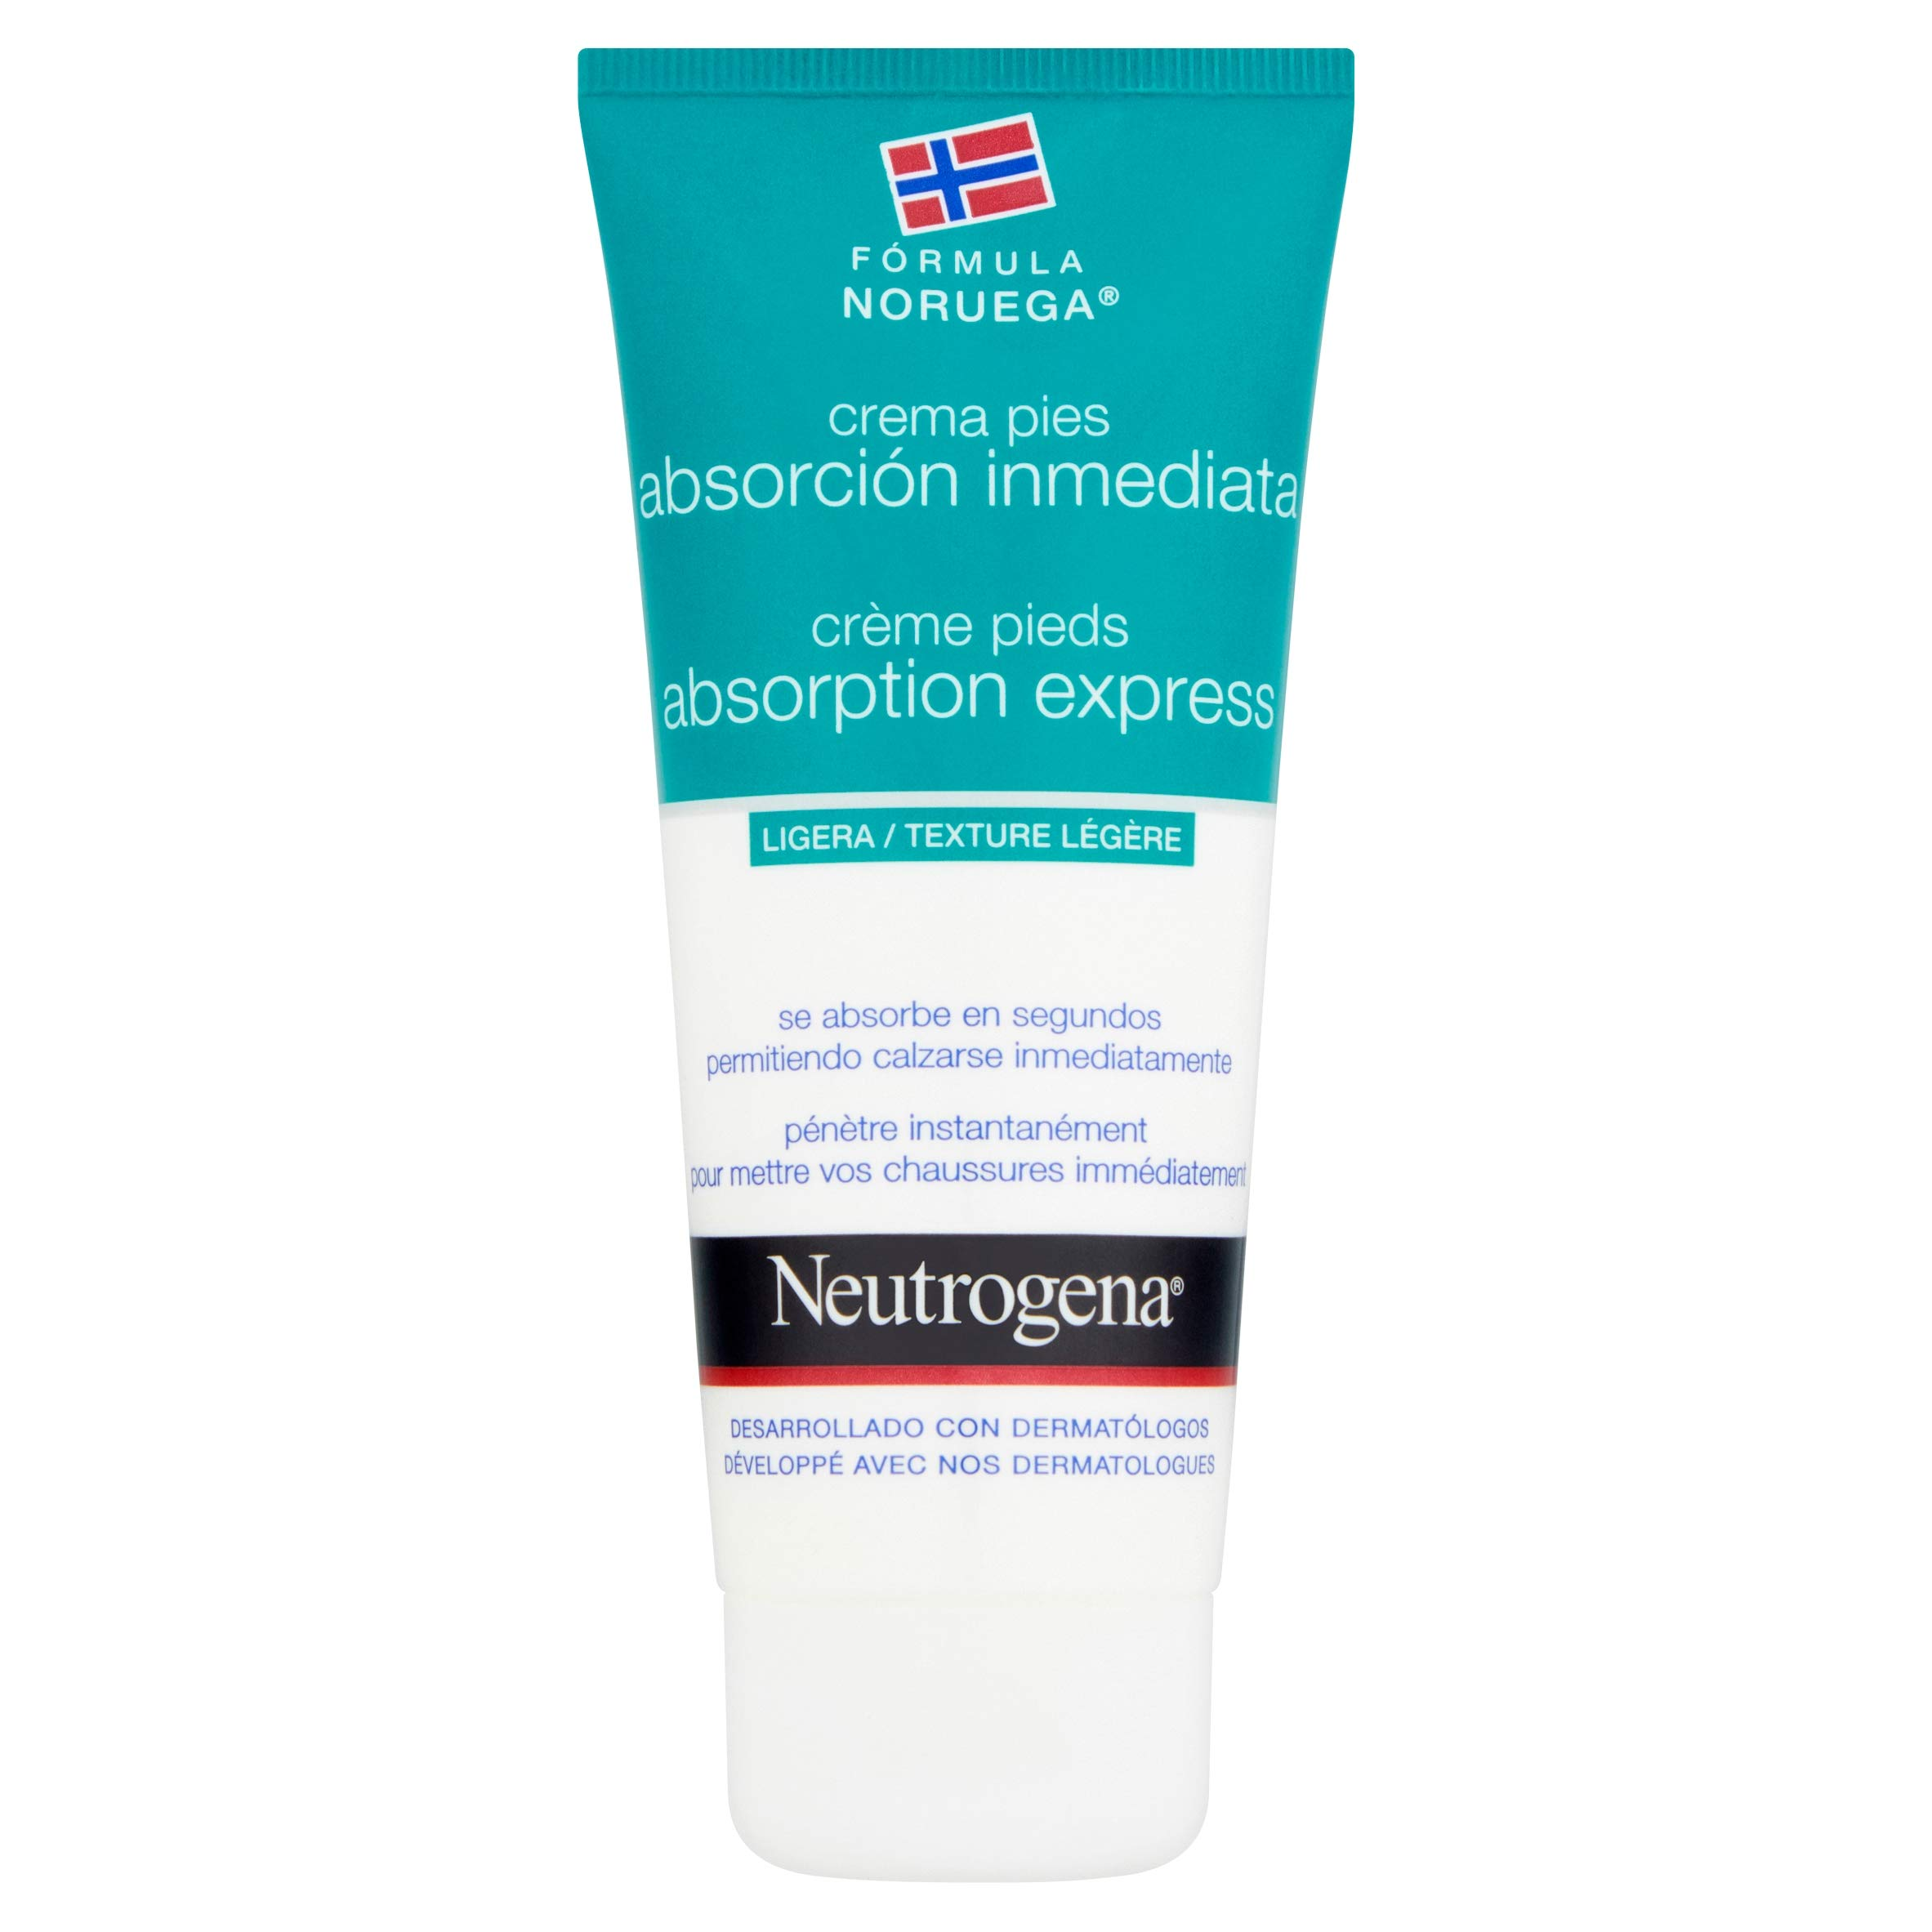 Neutrogena Crema de Pies Absorción Inmediata, Pieles Secas, 100 ml